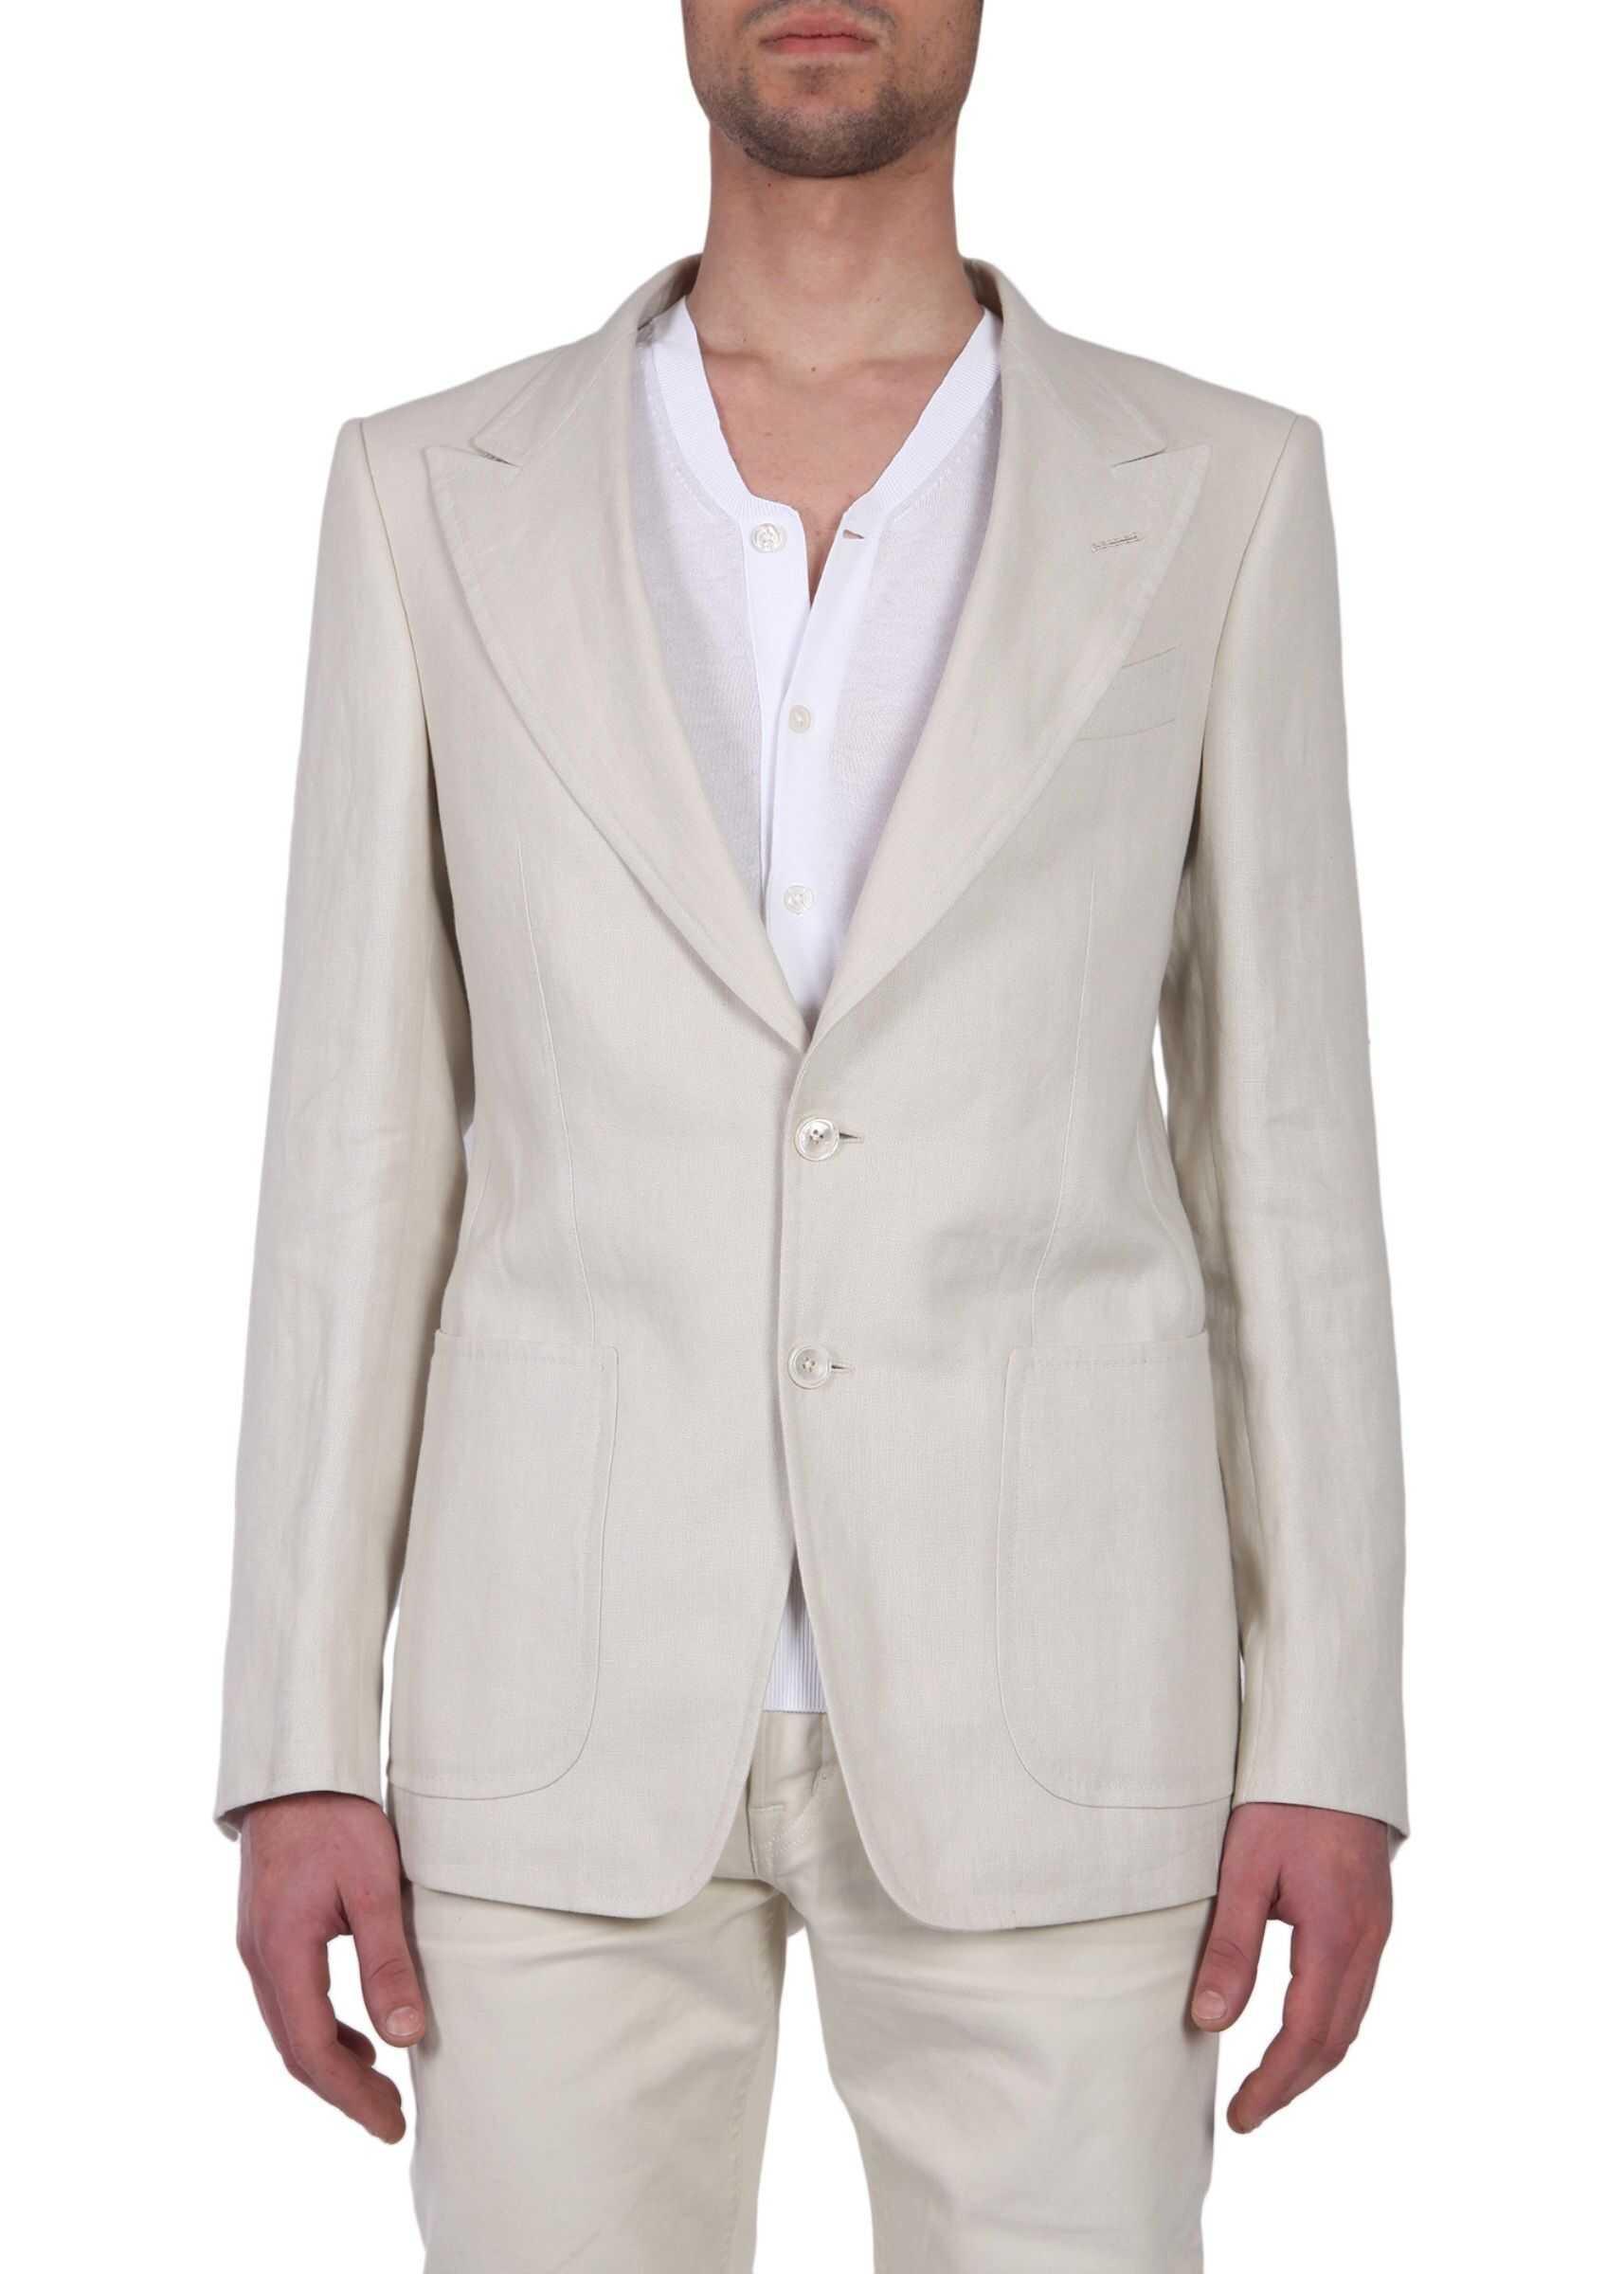 Tom Ford Single Breasted Jacket BEIGE imagine